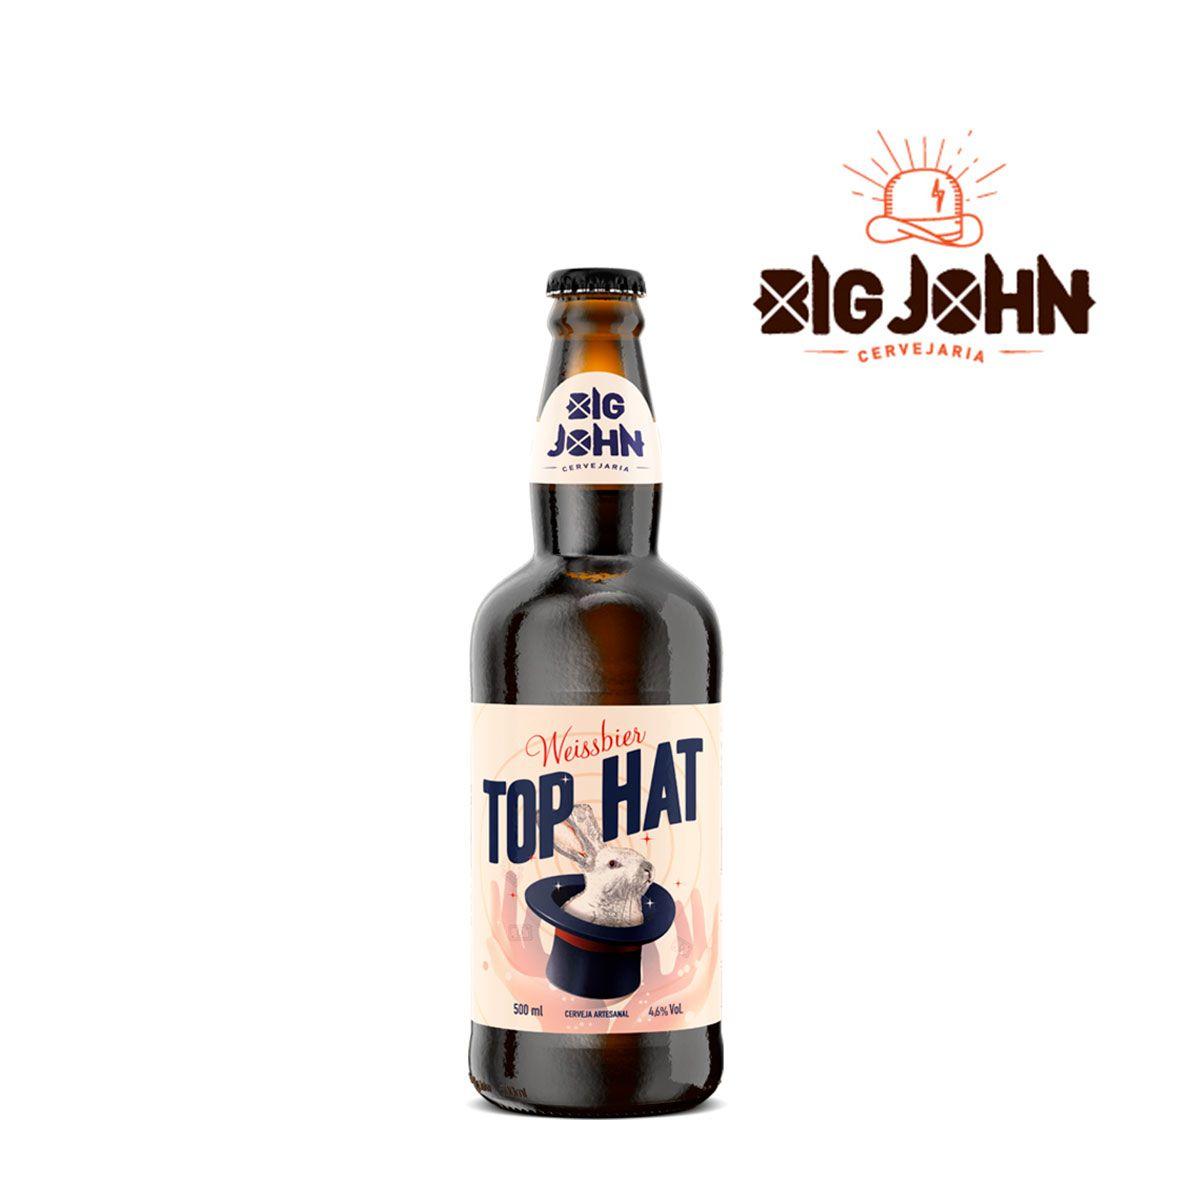 Cerveja Artesanal Big John Top Hat Weissbier 500ml